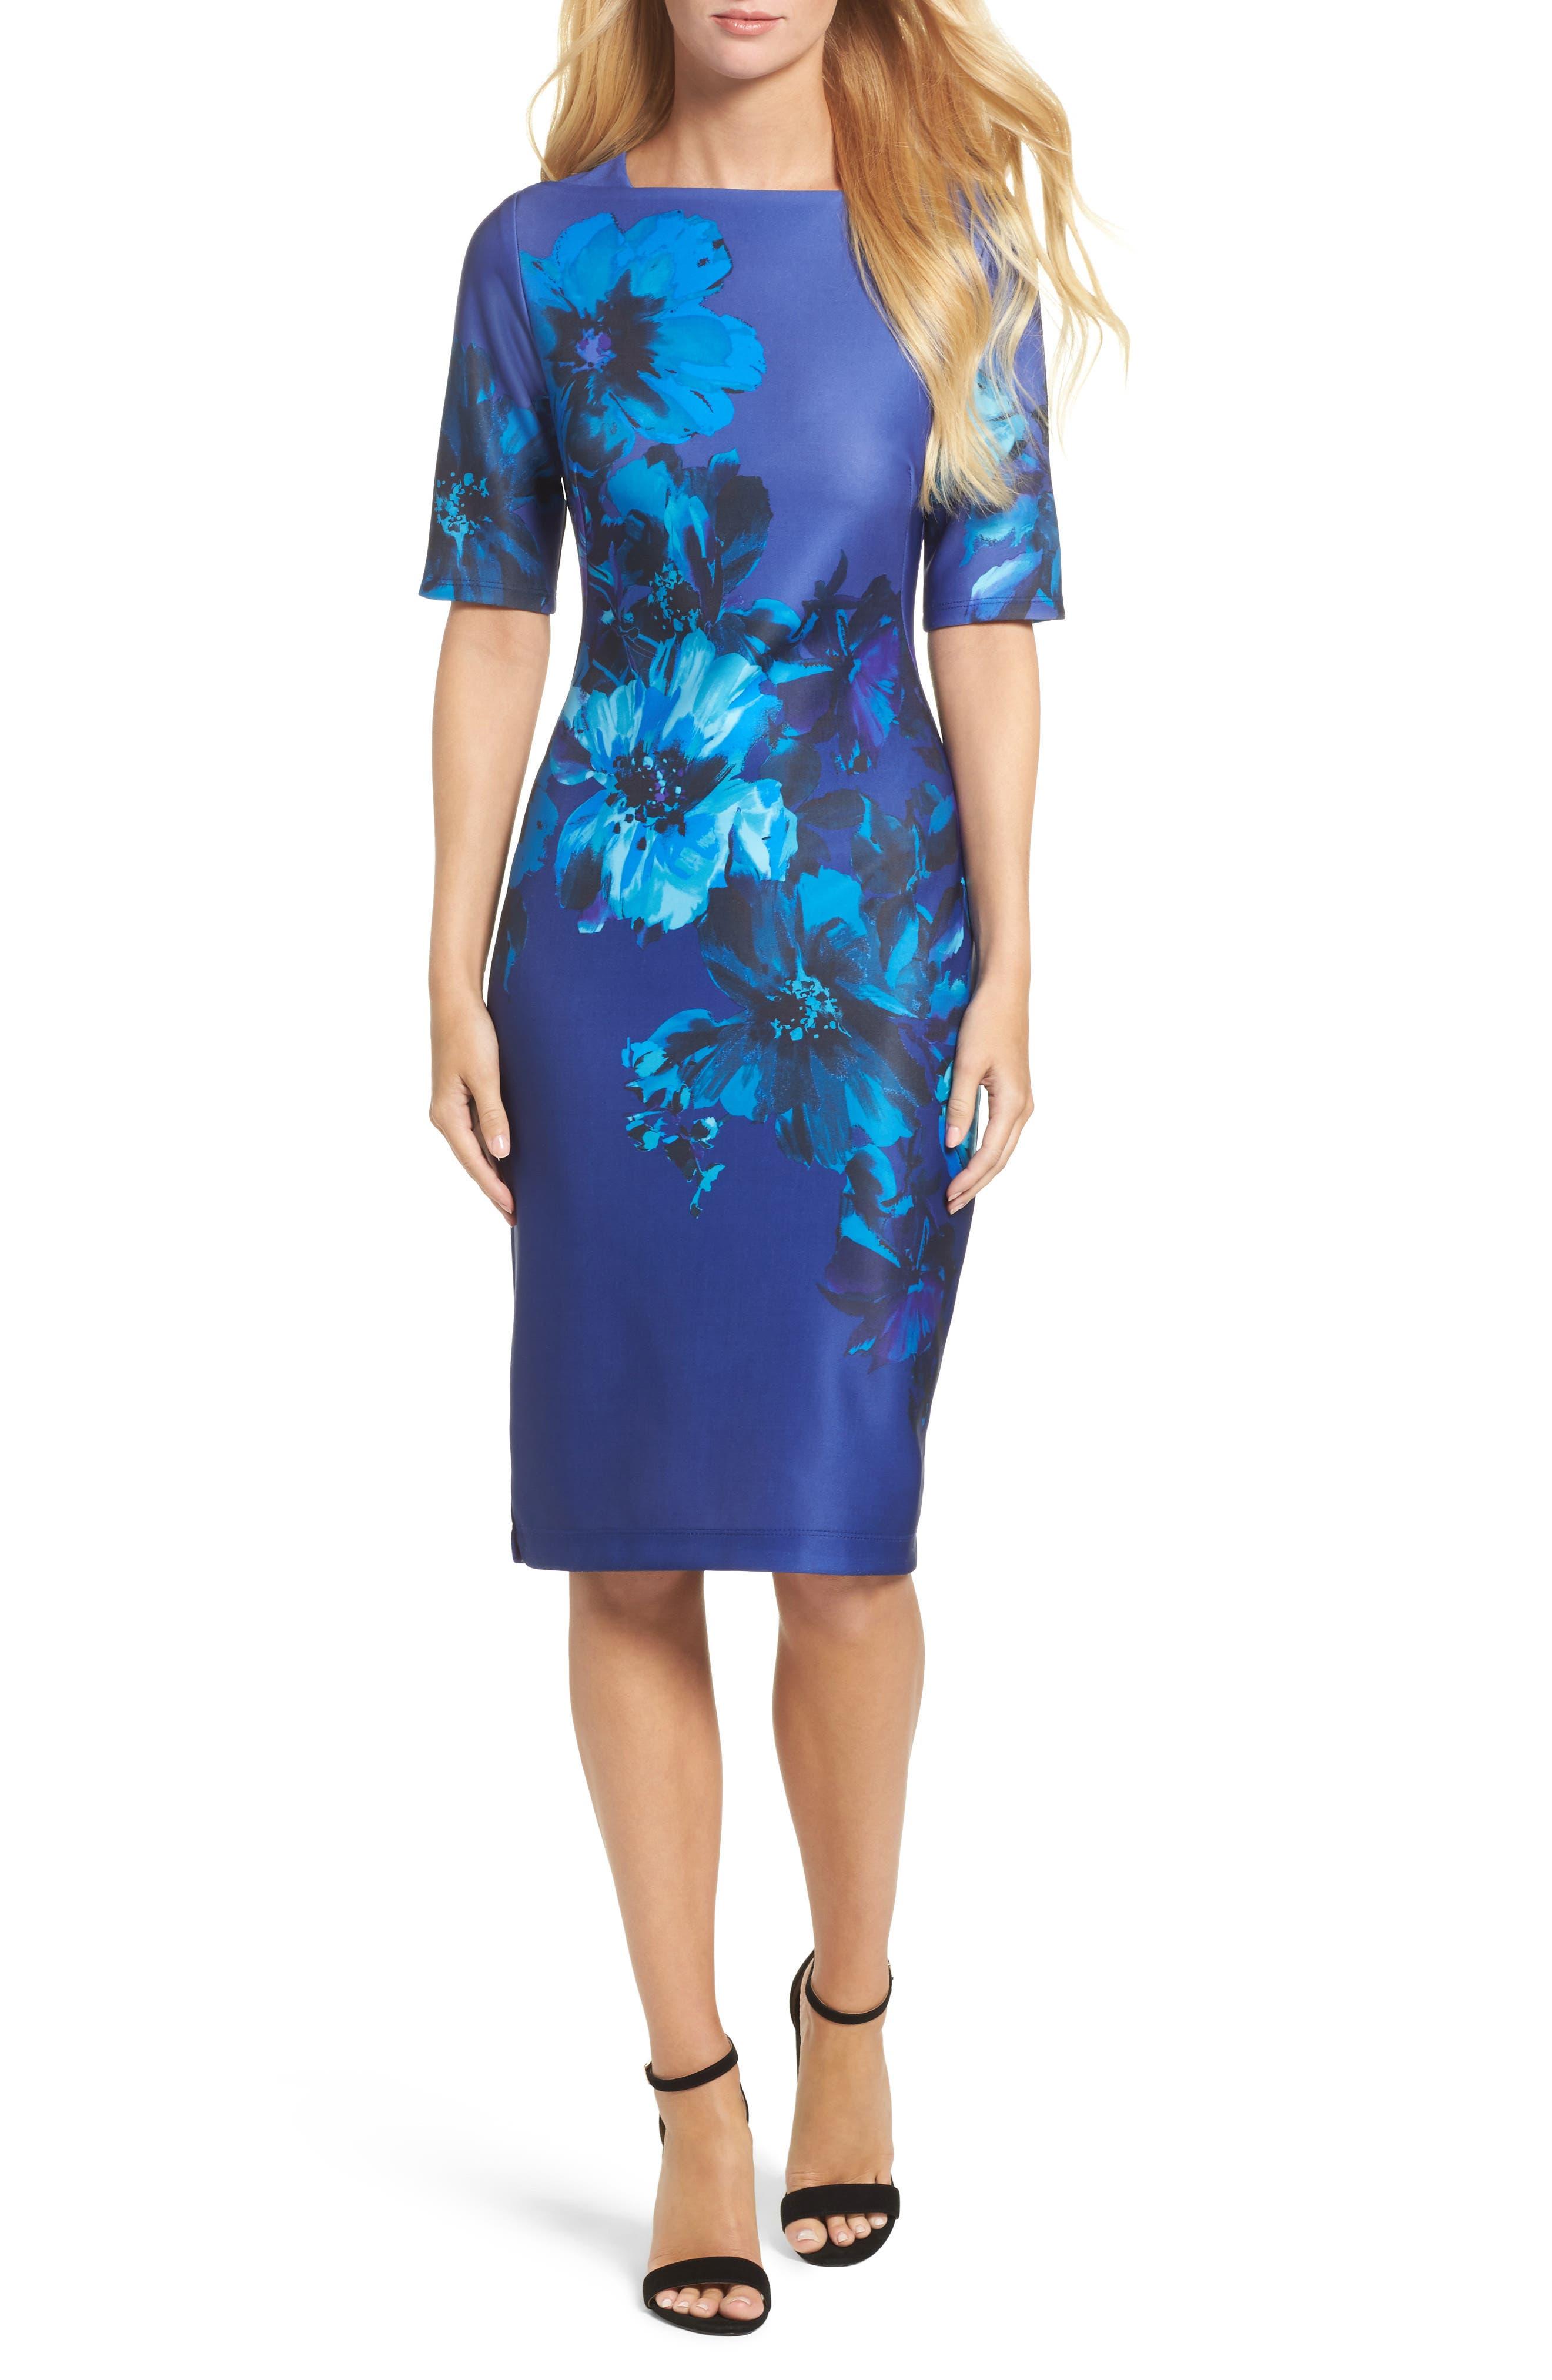 Alternate Image 1 Selected - Gabby Skye Floral Print Scuba Sheath Dress